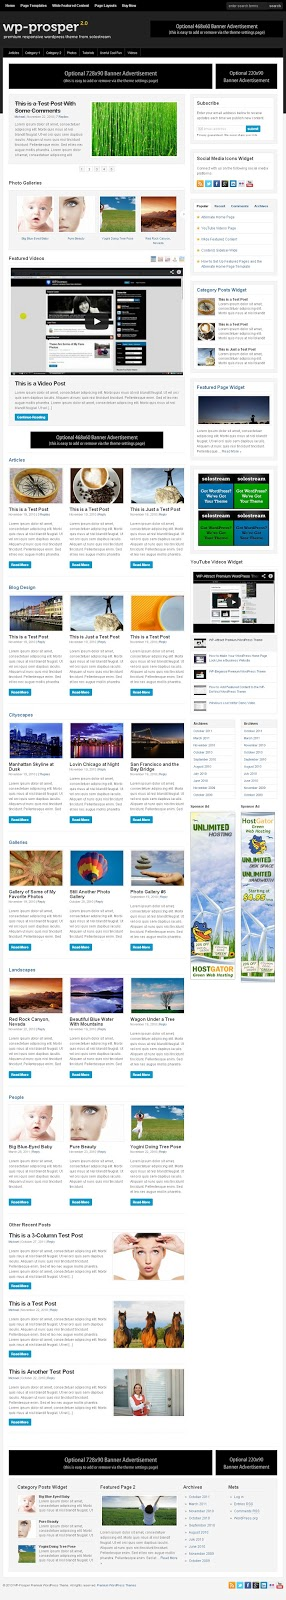 WP Prosper Premium WordPress Theme